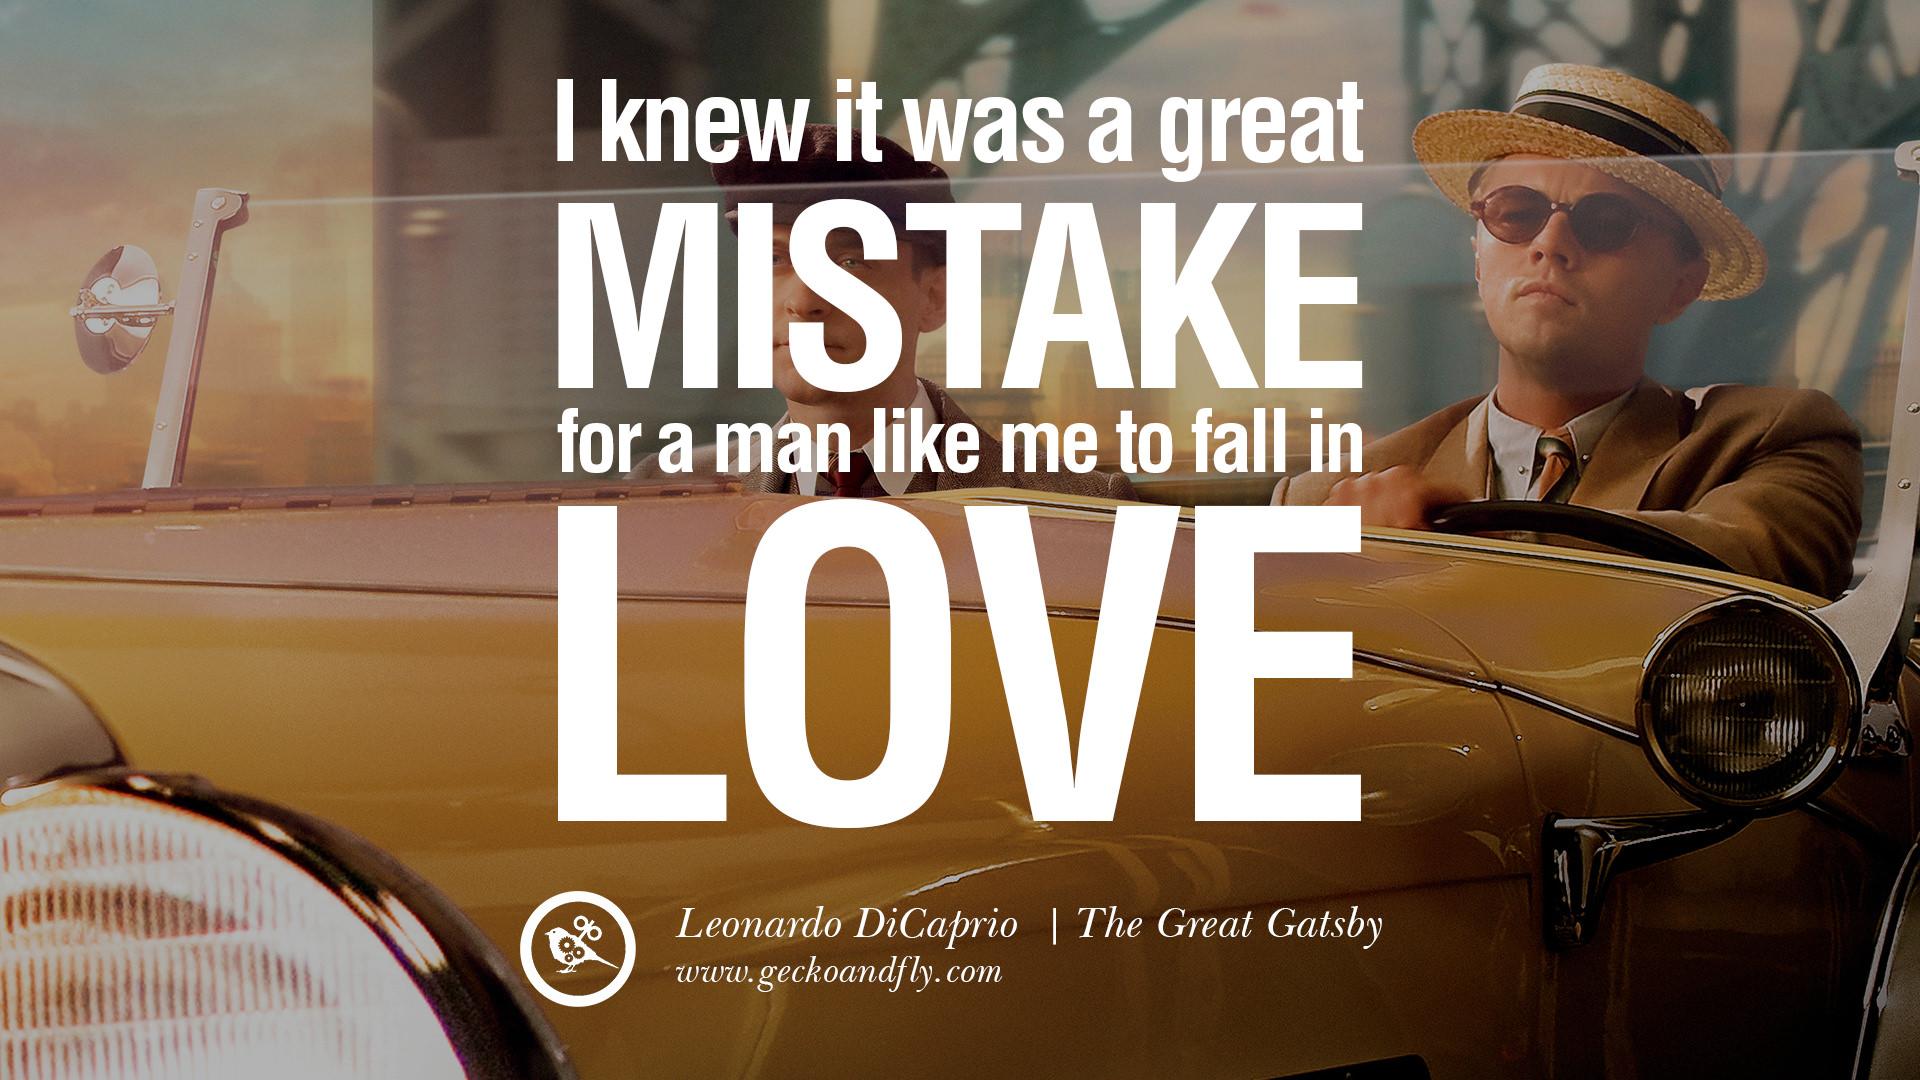 great gatsby essay lies